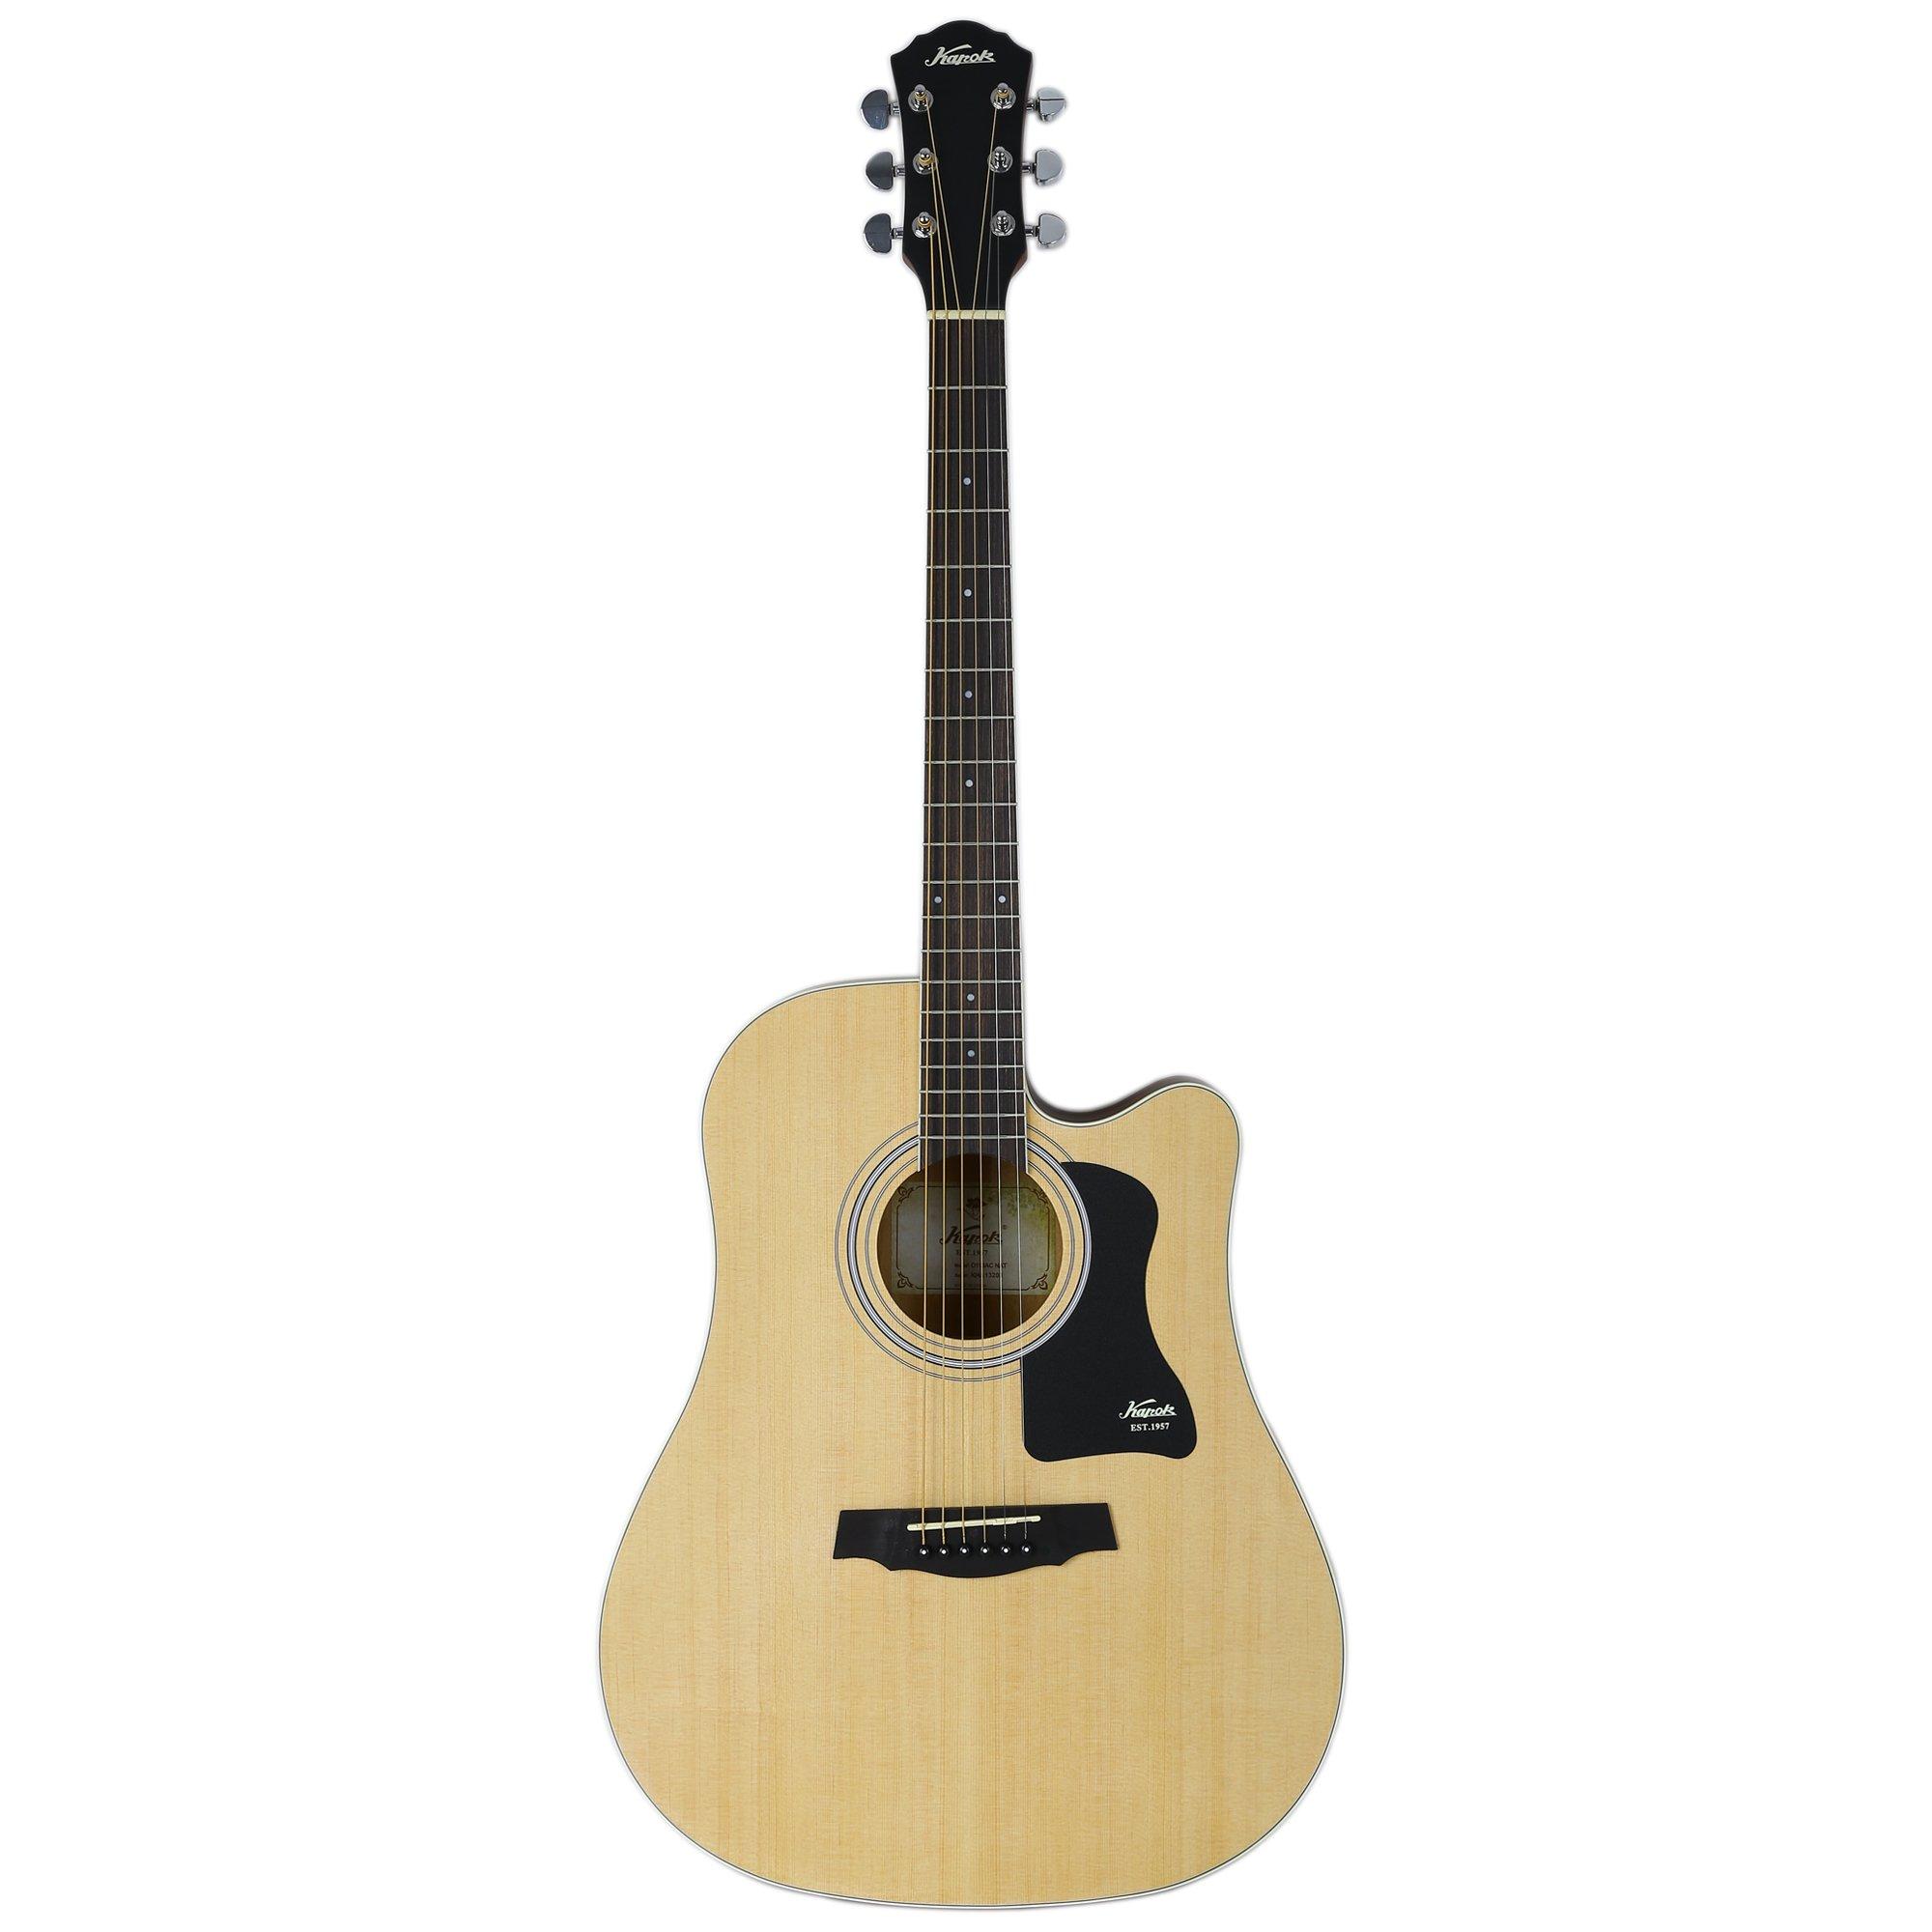 "KAPOK AZ-D218NAT 41"" Full Size Dreadnought Cutaway Acoustic Guitar - Natural"